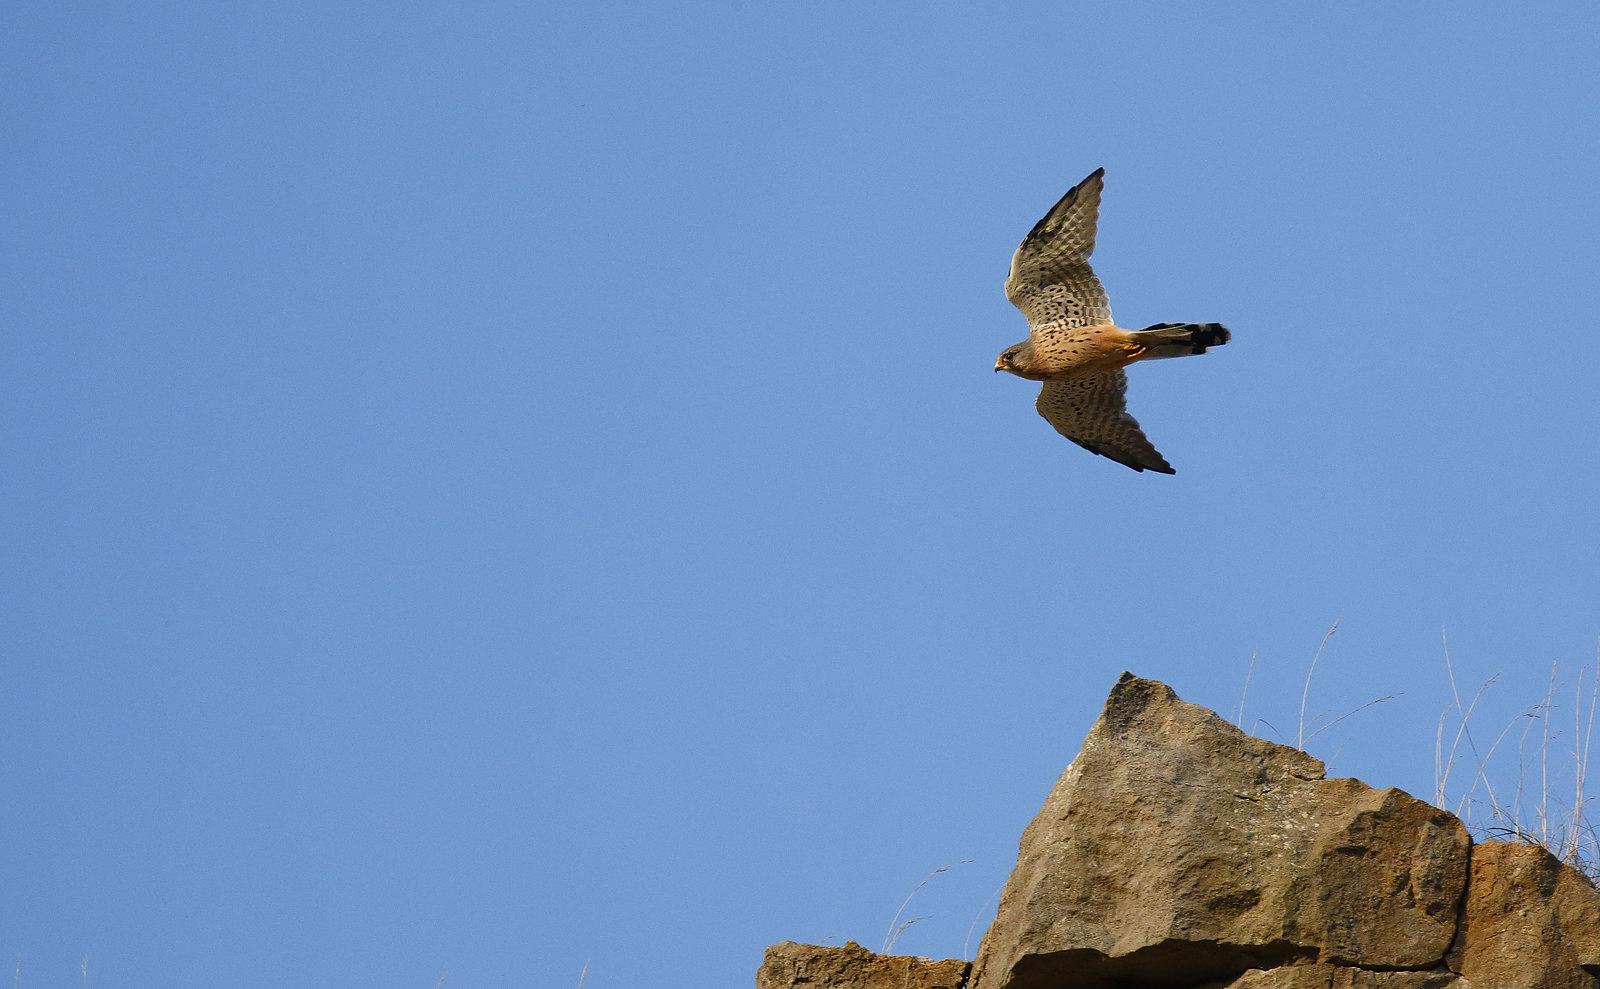 Kestrel riding the cliff edge